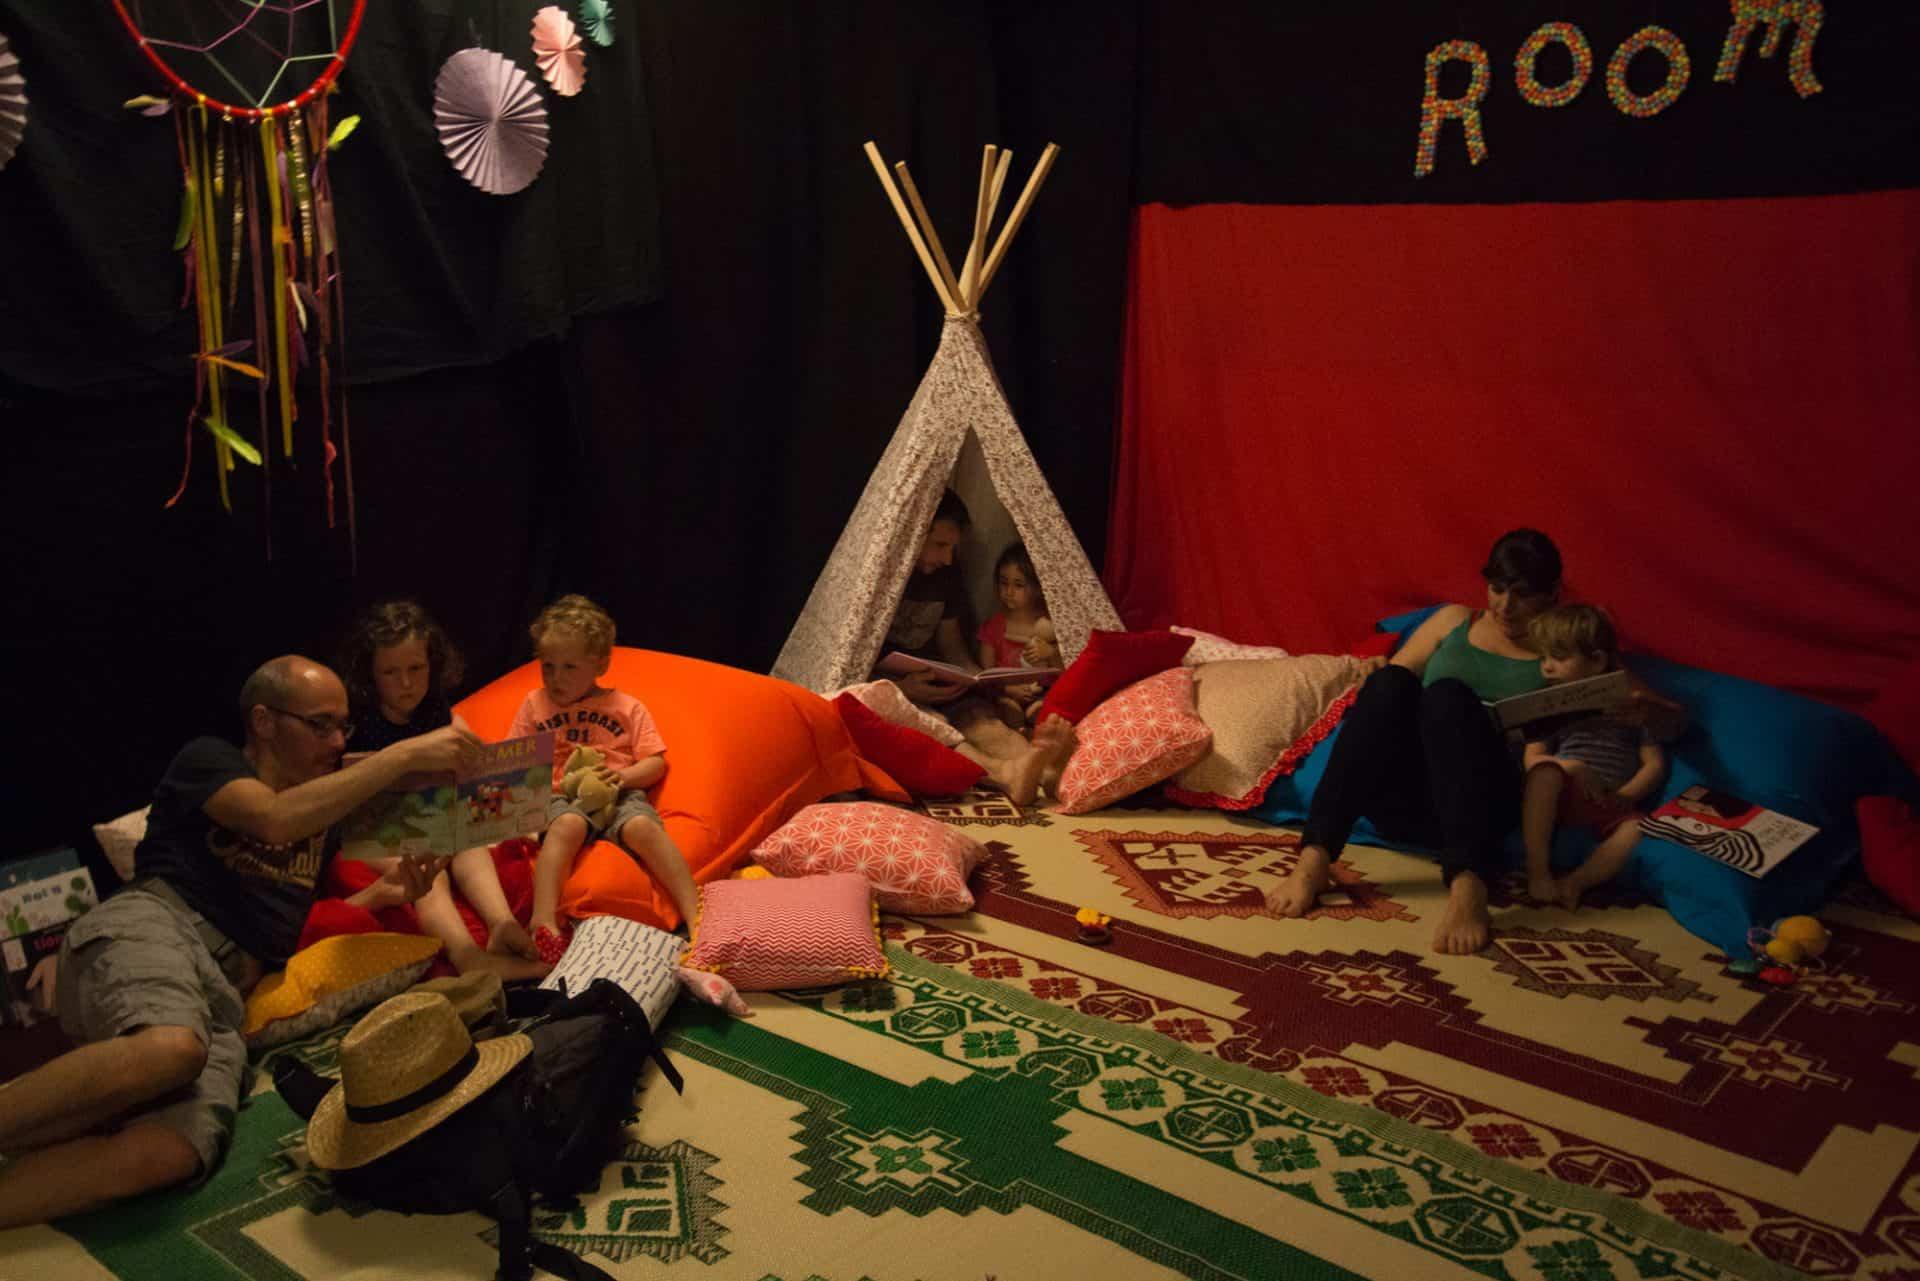 Photo Sweet Room - La Fête #7